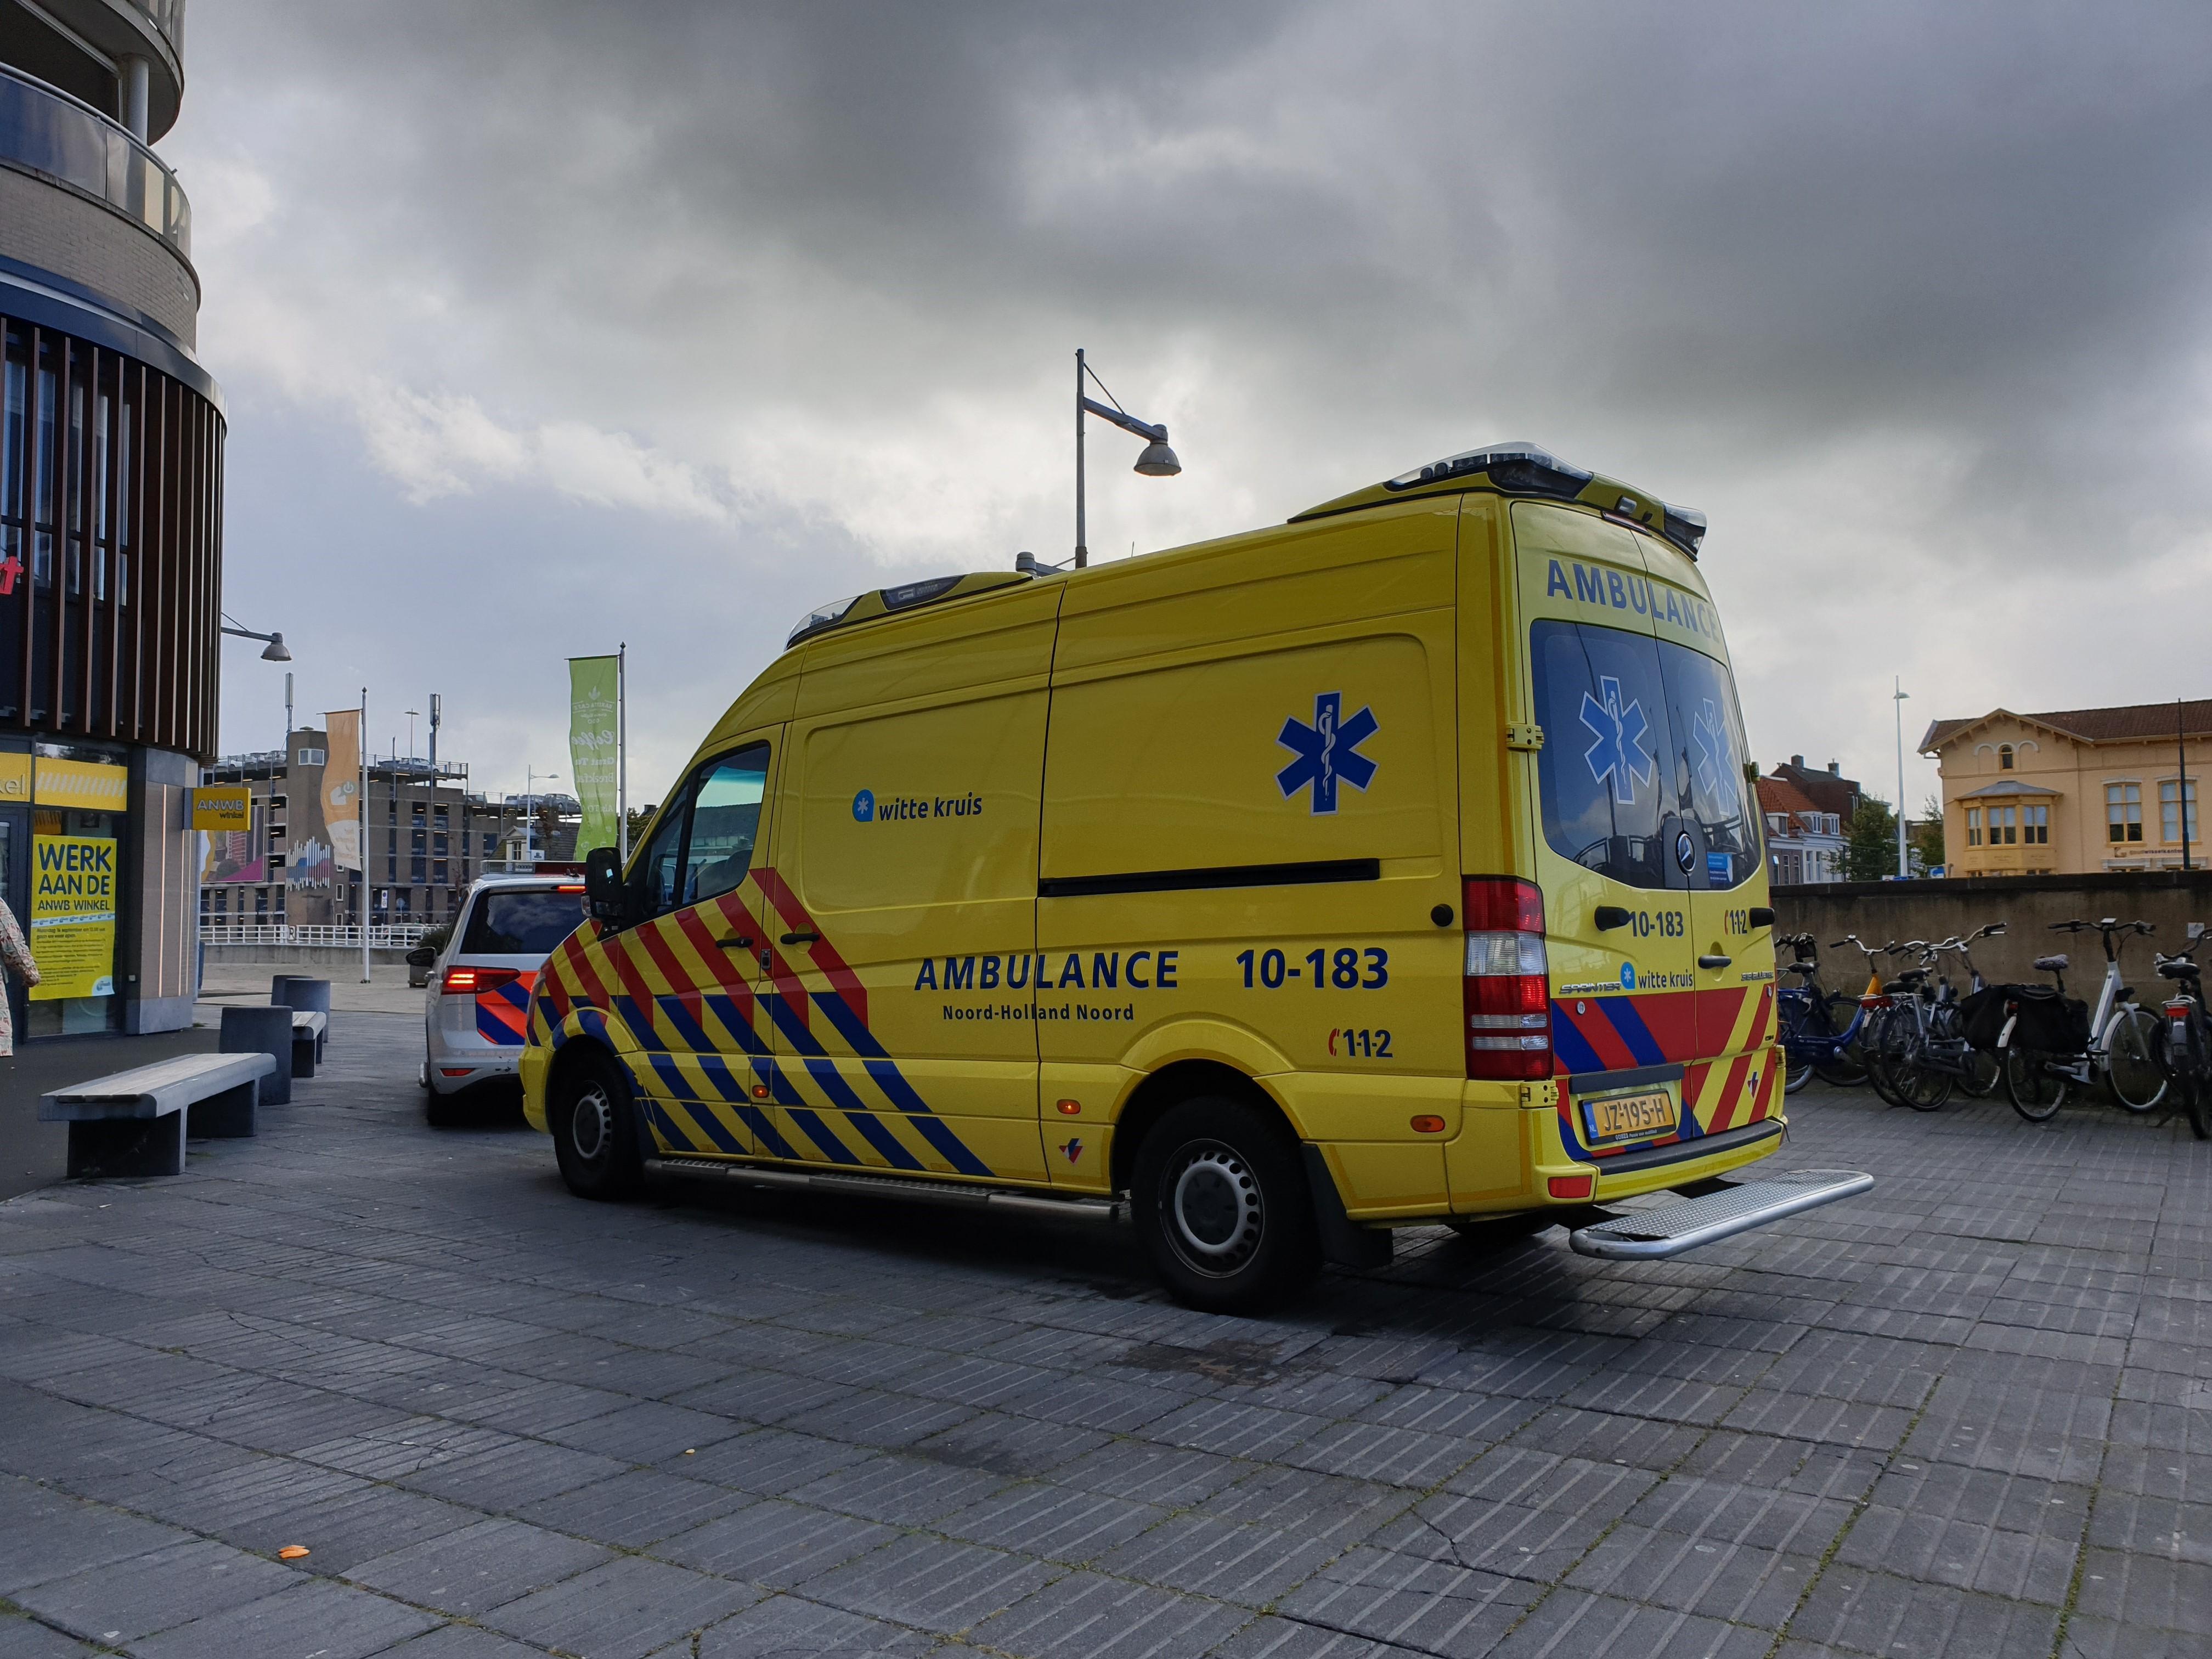 Persoon gewond na val van roltrap in winkelcentrum Alkmaar